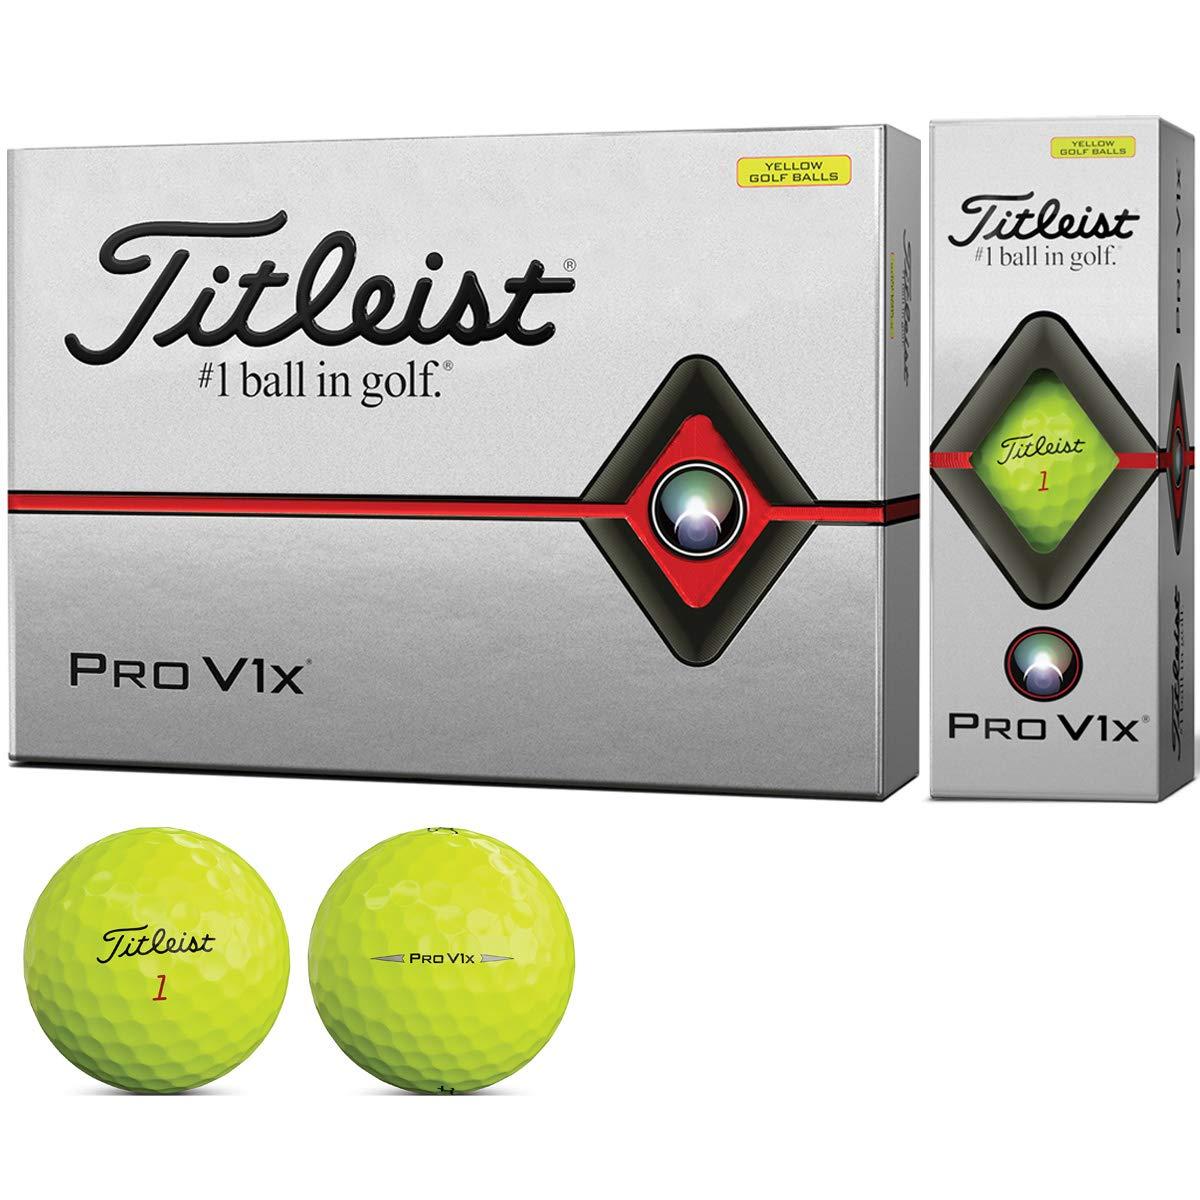 Titleist PRO V1x YELLOW タイトリスト プロブイワンエックス イエロー ボール 2ダースパック 24球 ゴルフ 送料無料 平成最後 令和 新生活